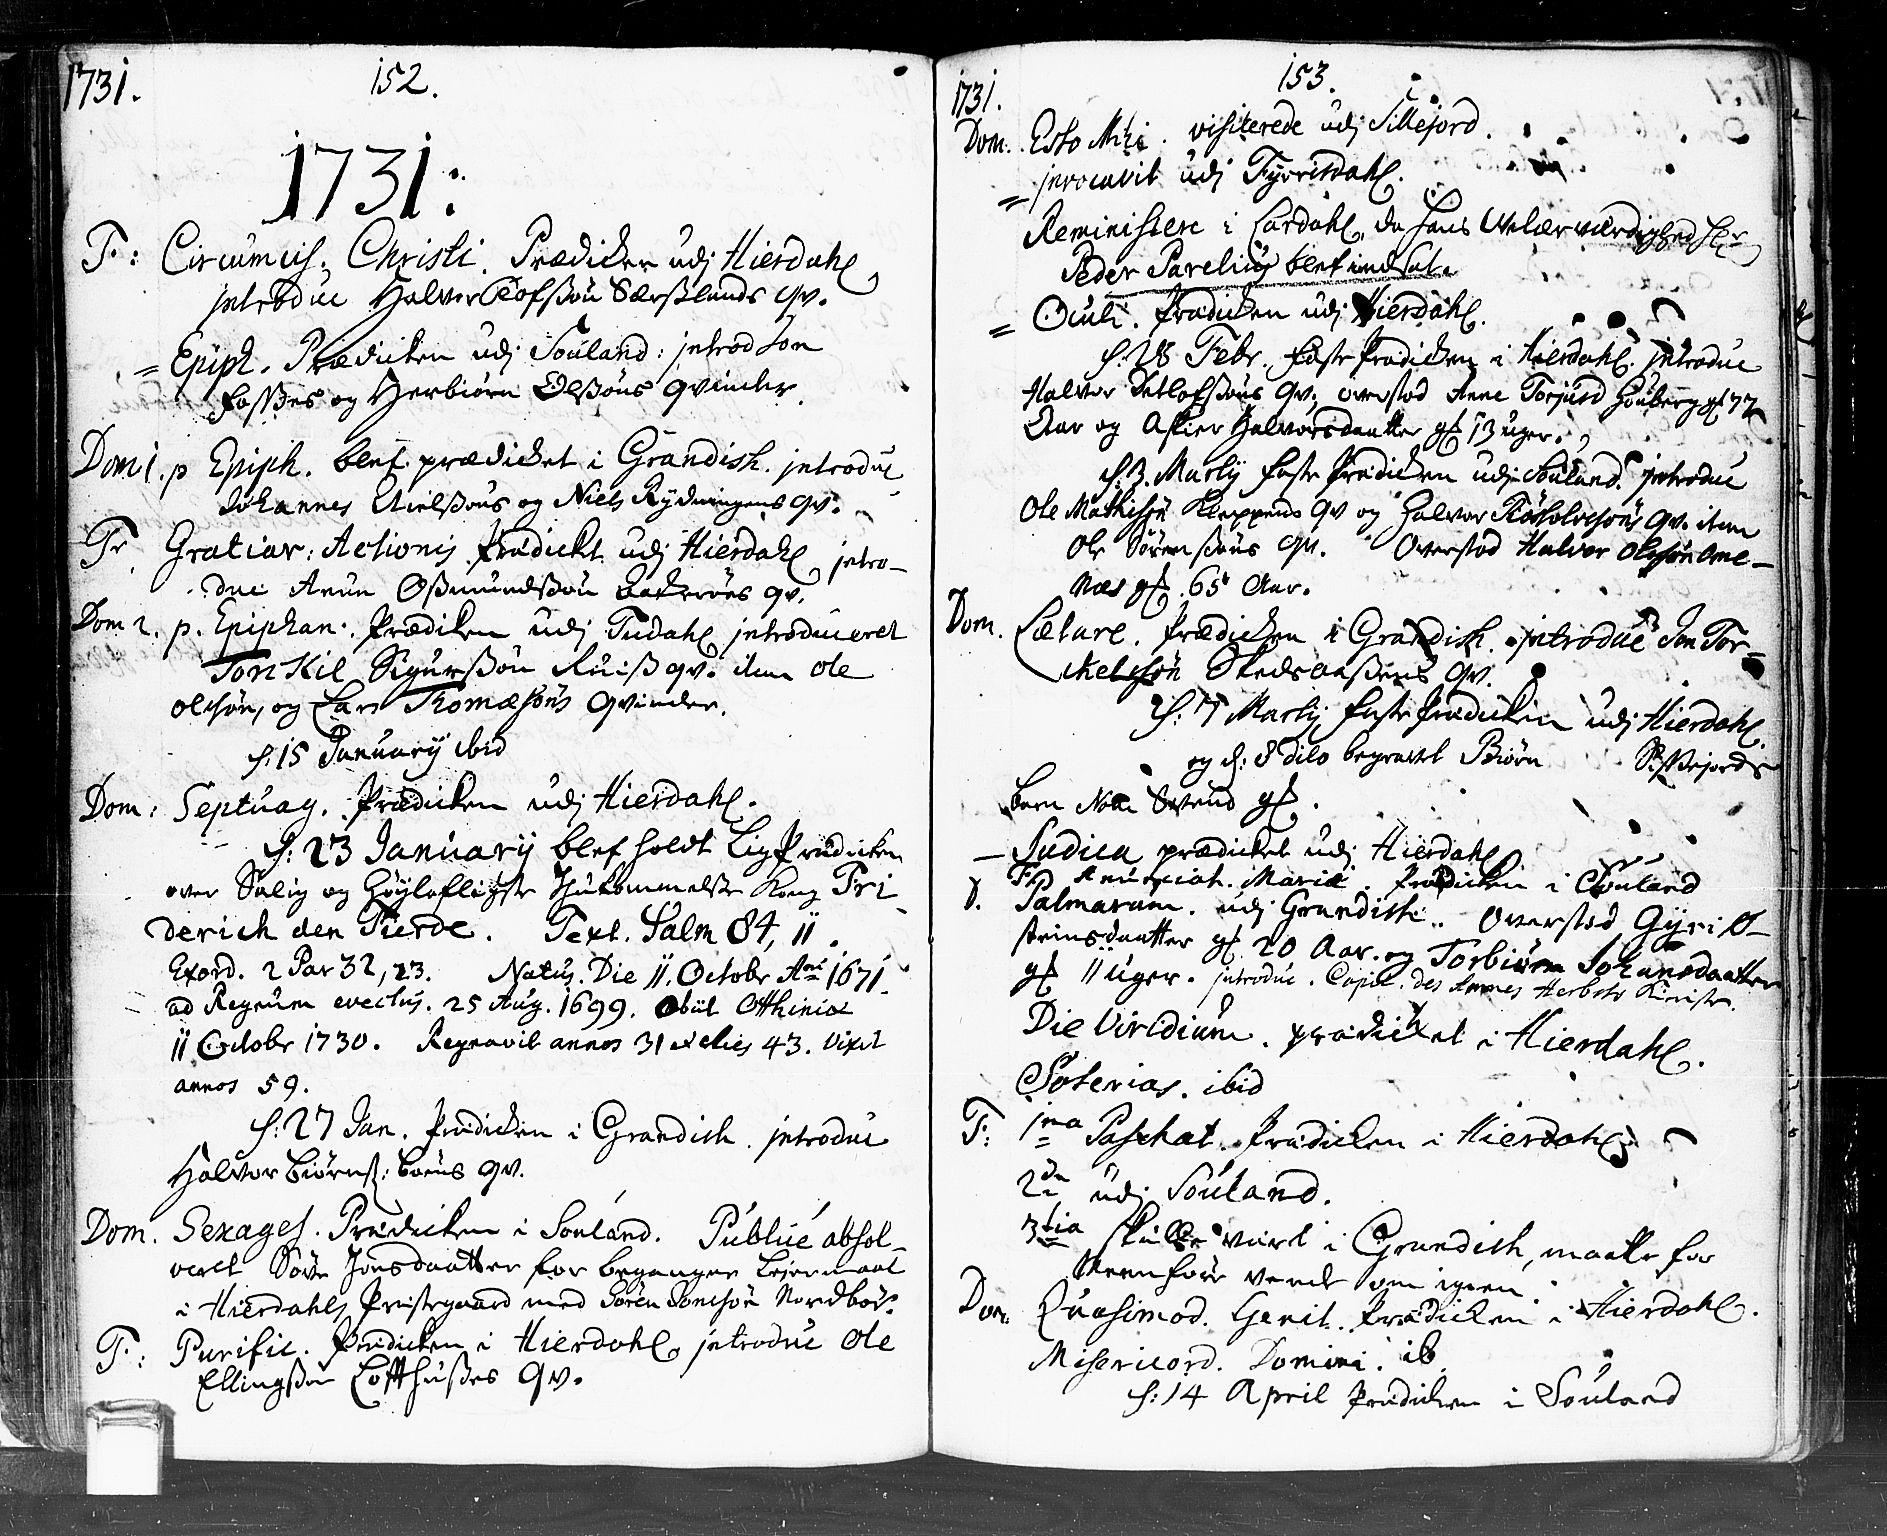 SAKO, Hjartdal kirkebøker, F/Fa/L0002: Ministerialbok nr. I 2, 1716-1754, s. 152-153